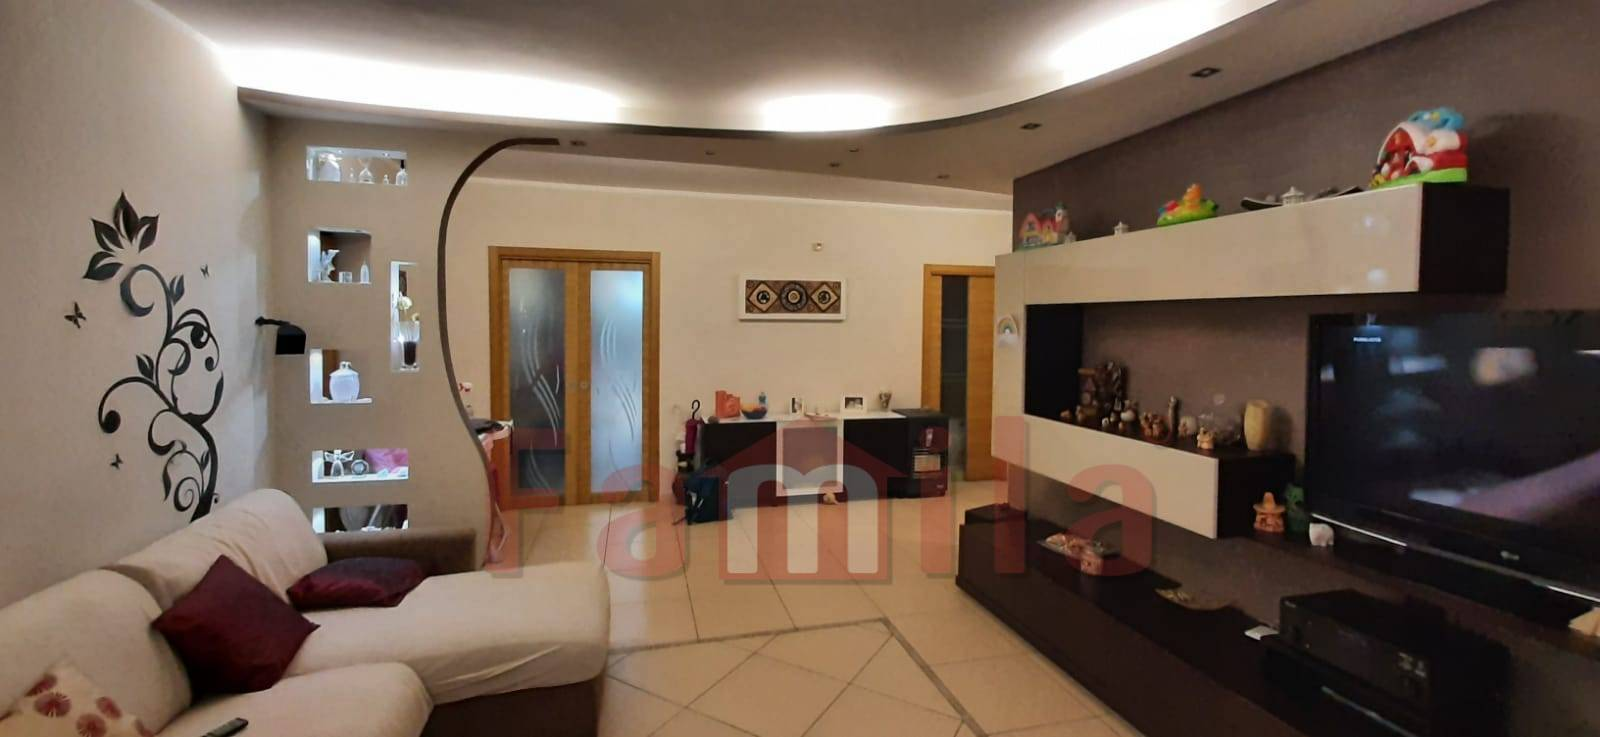 Appartamento in vendita a Sperone (AV)